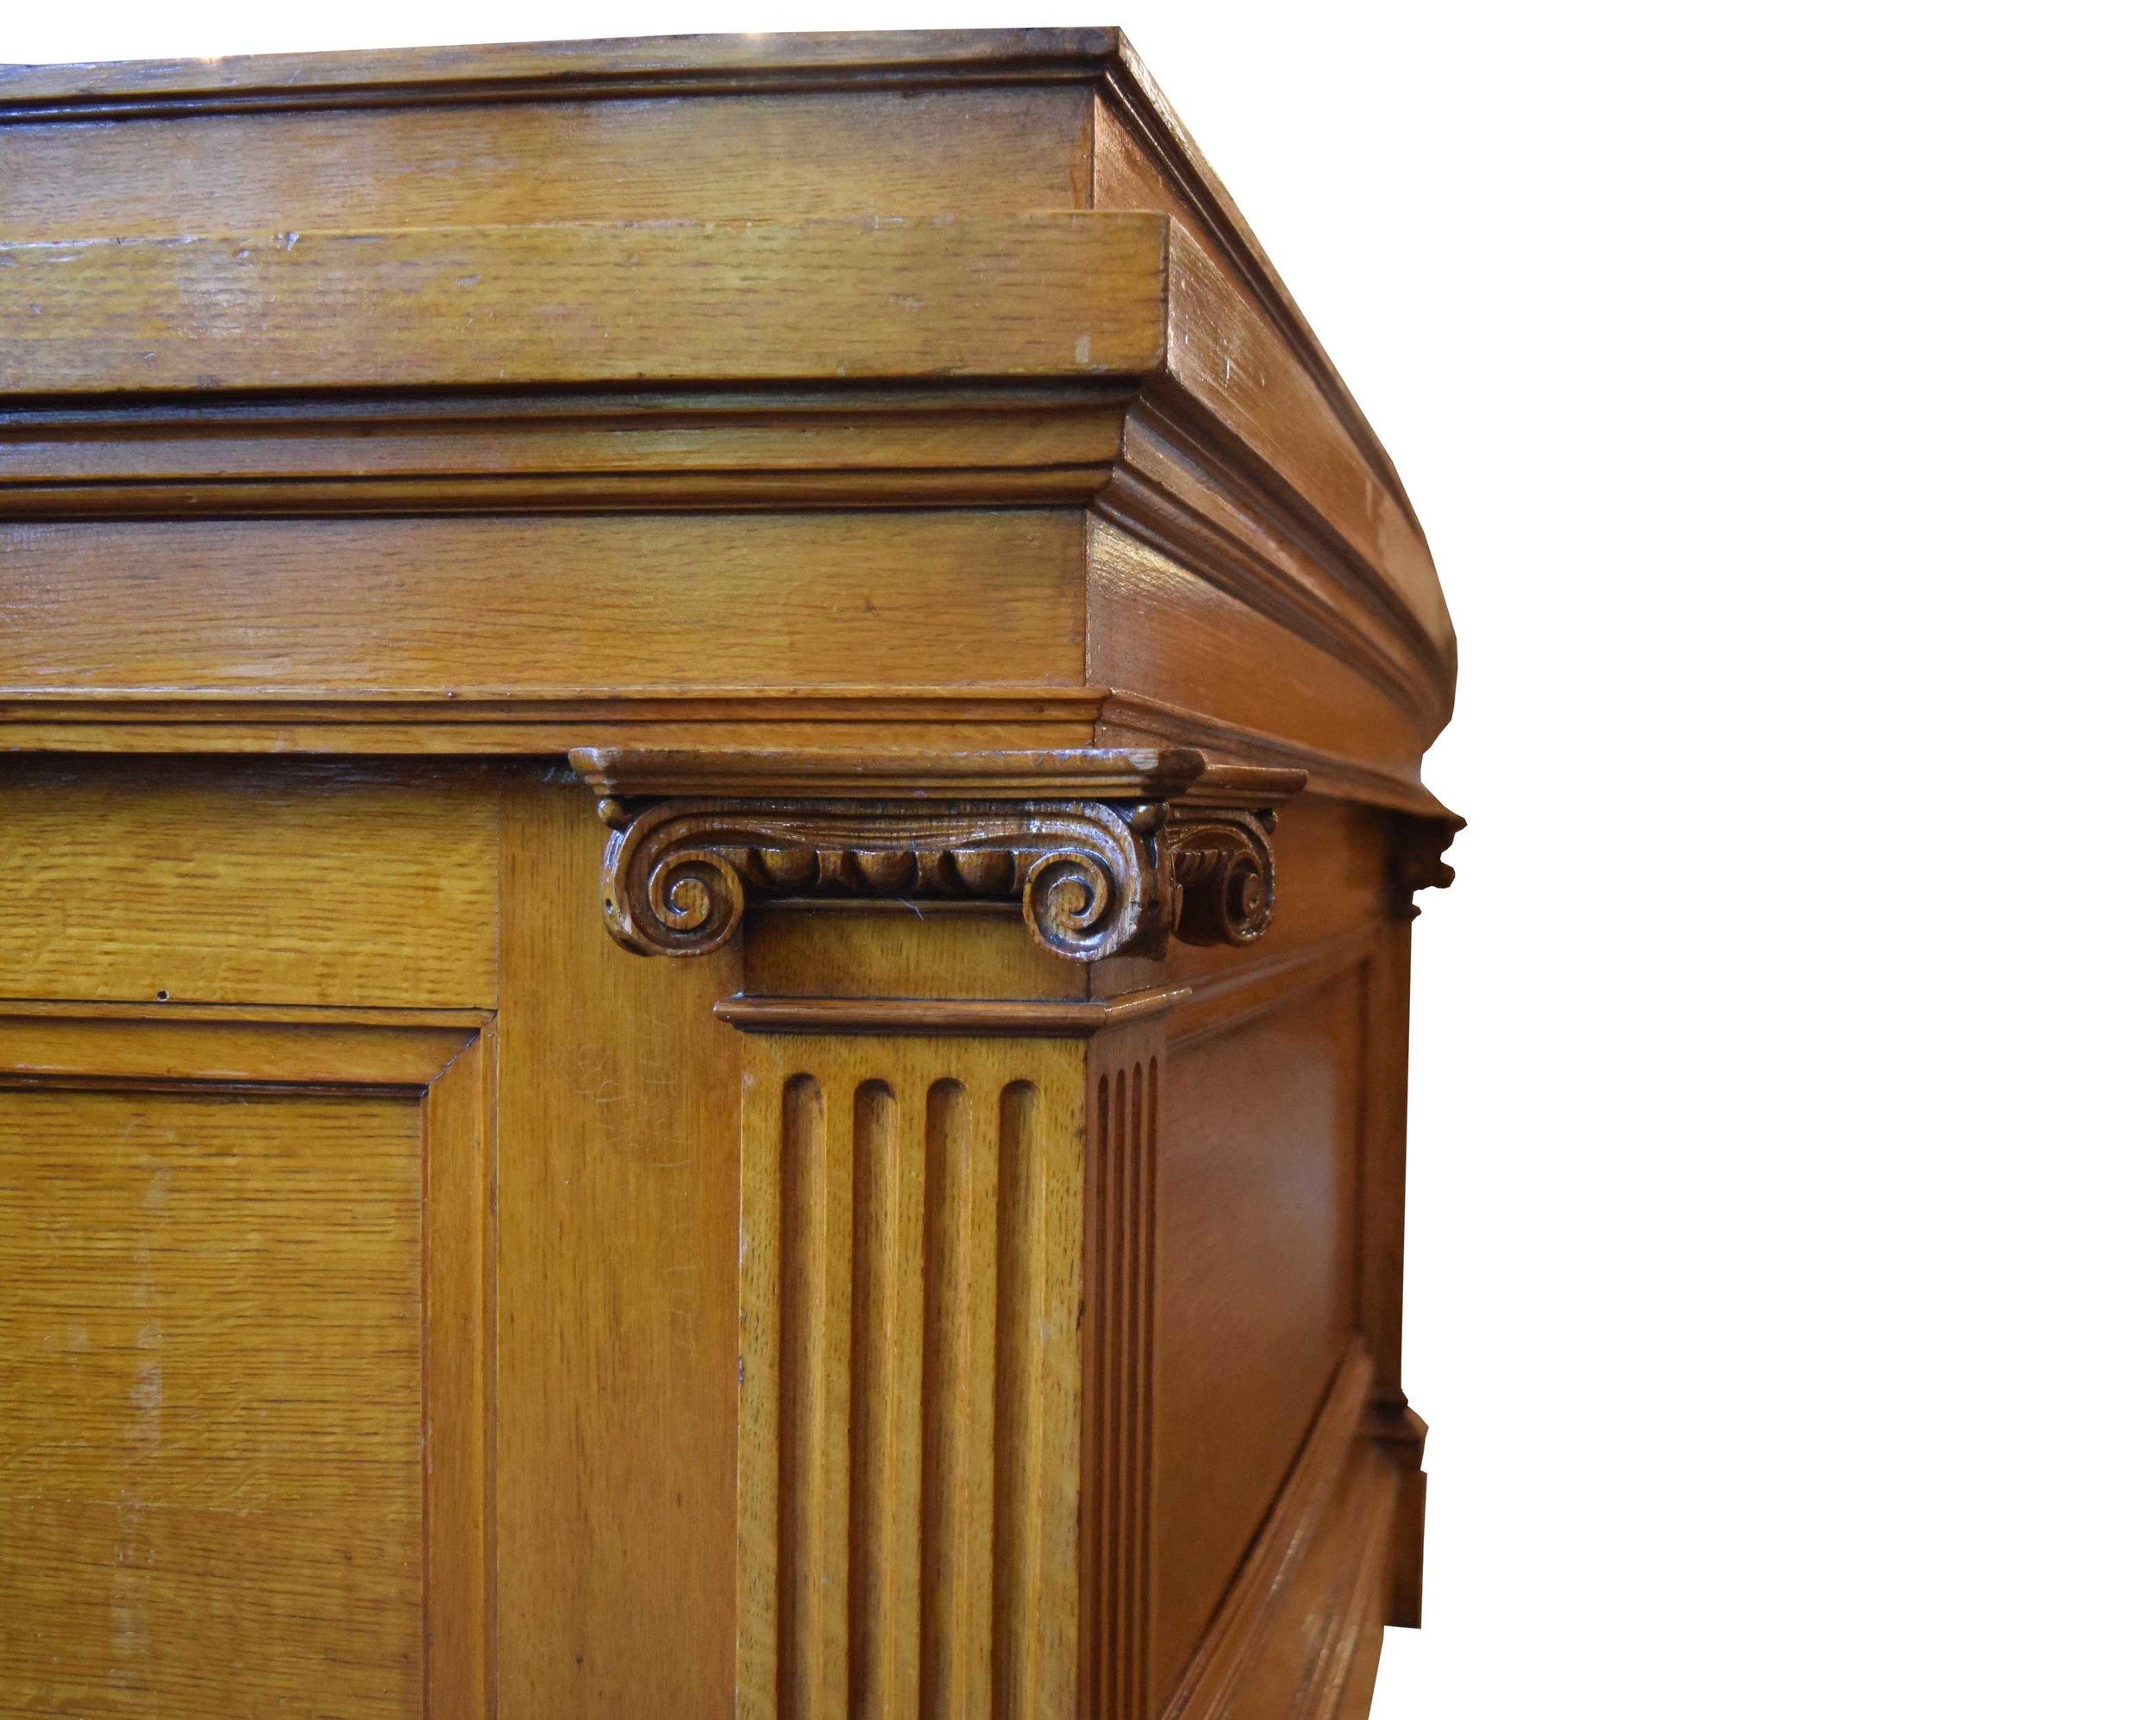 47981_oak_judges_bench_detail2.jpg